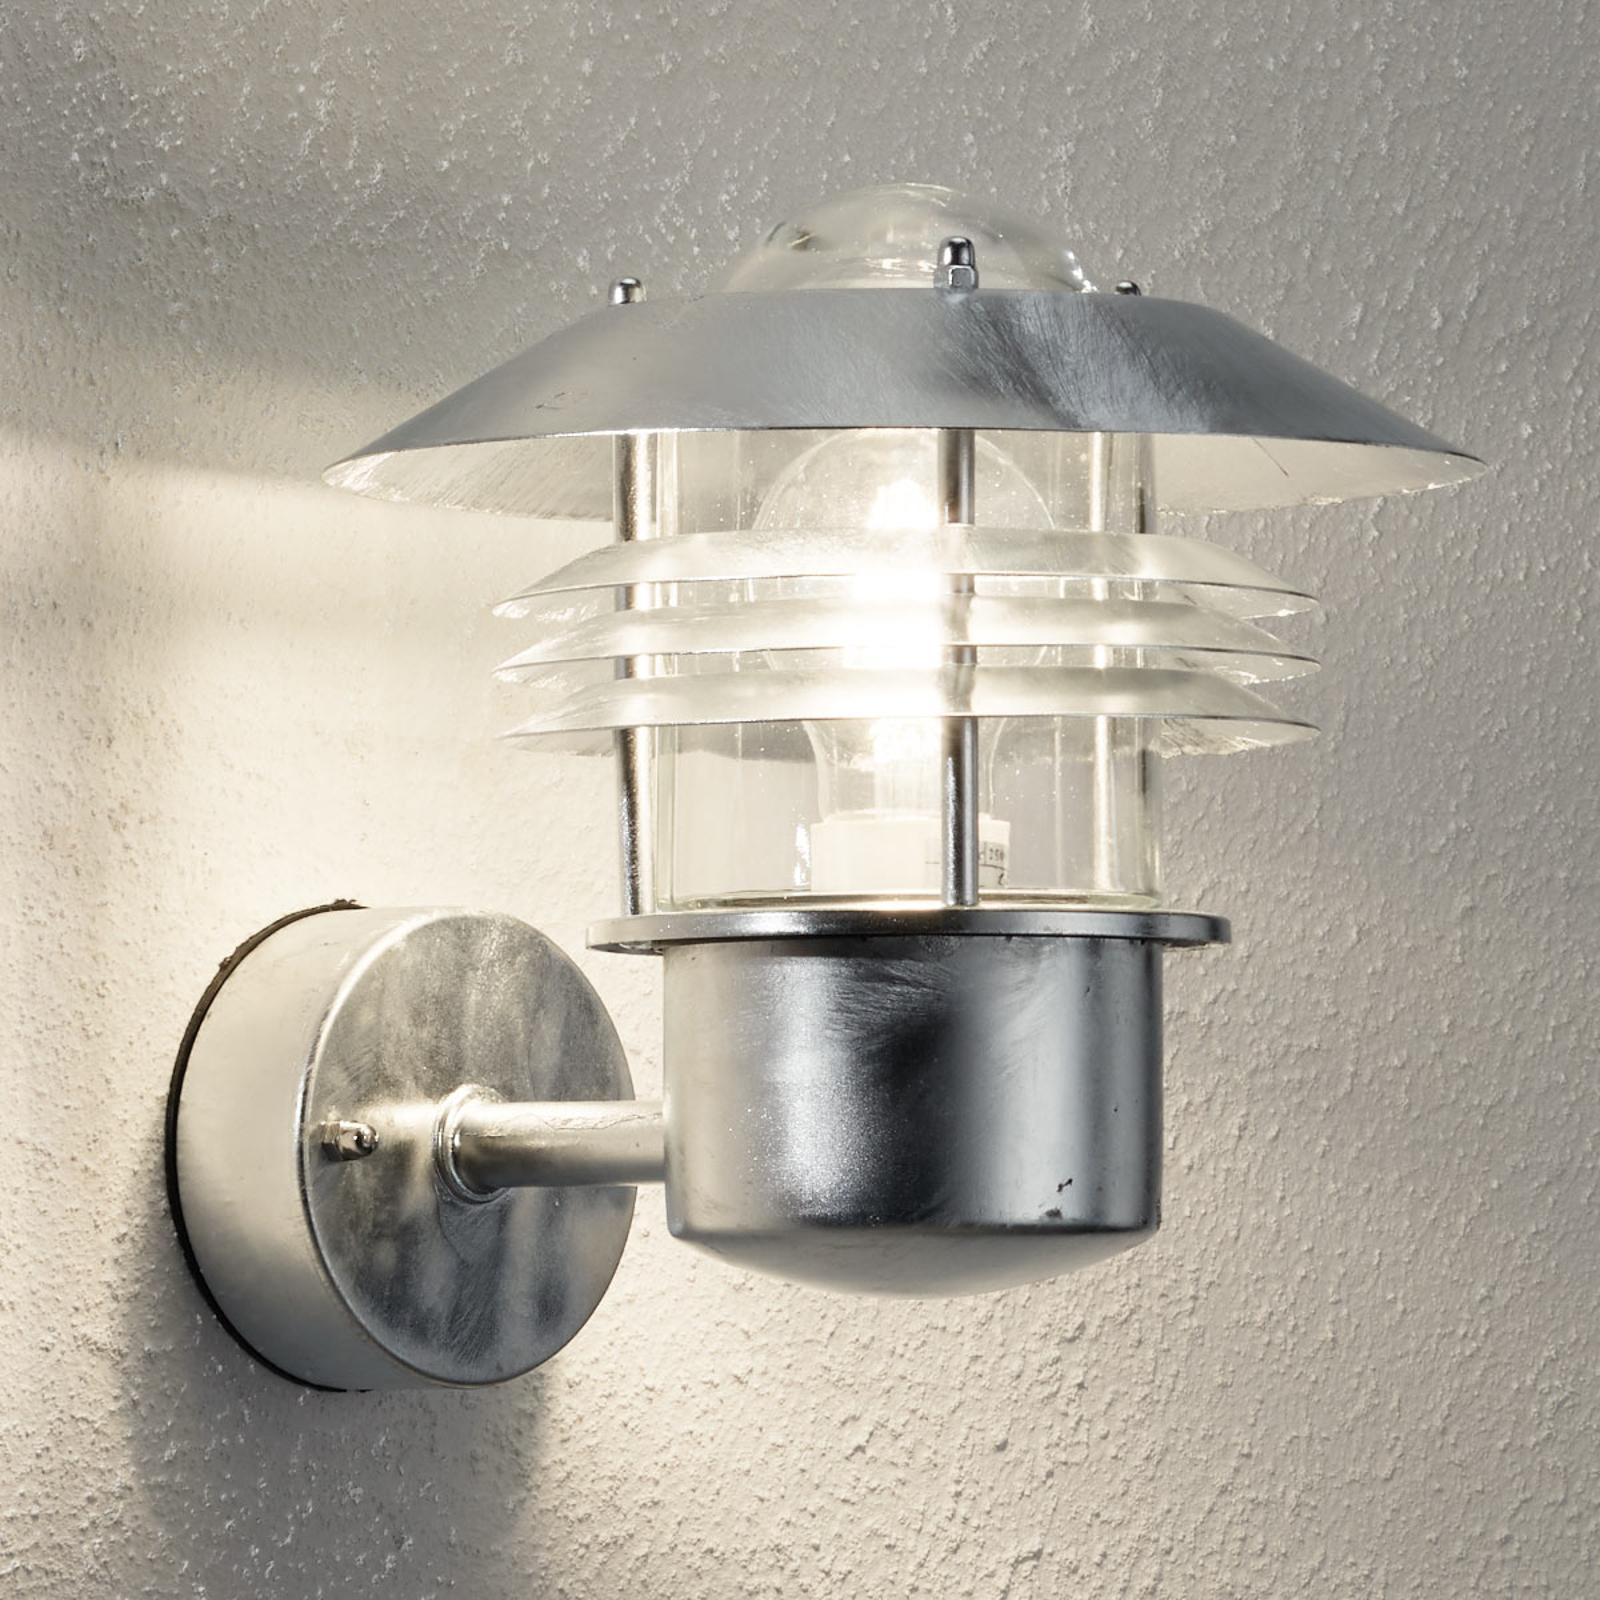 lampada da parete esterna Vejers, senza sensore